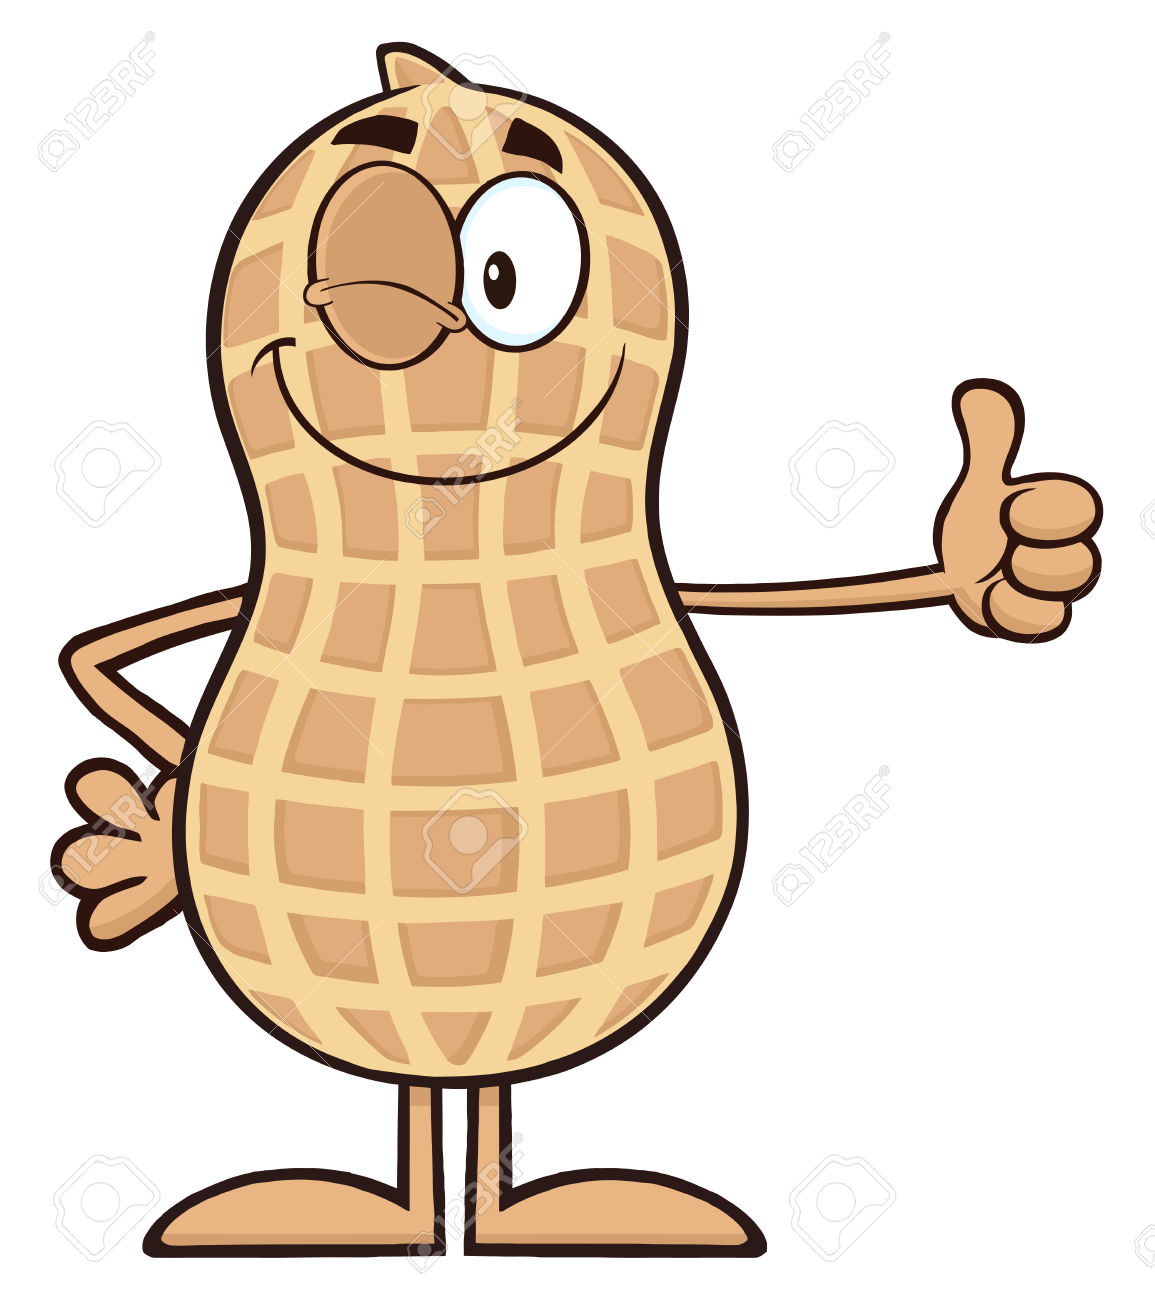 1155x1300 Peanut Clipart Groundnut